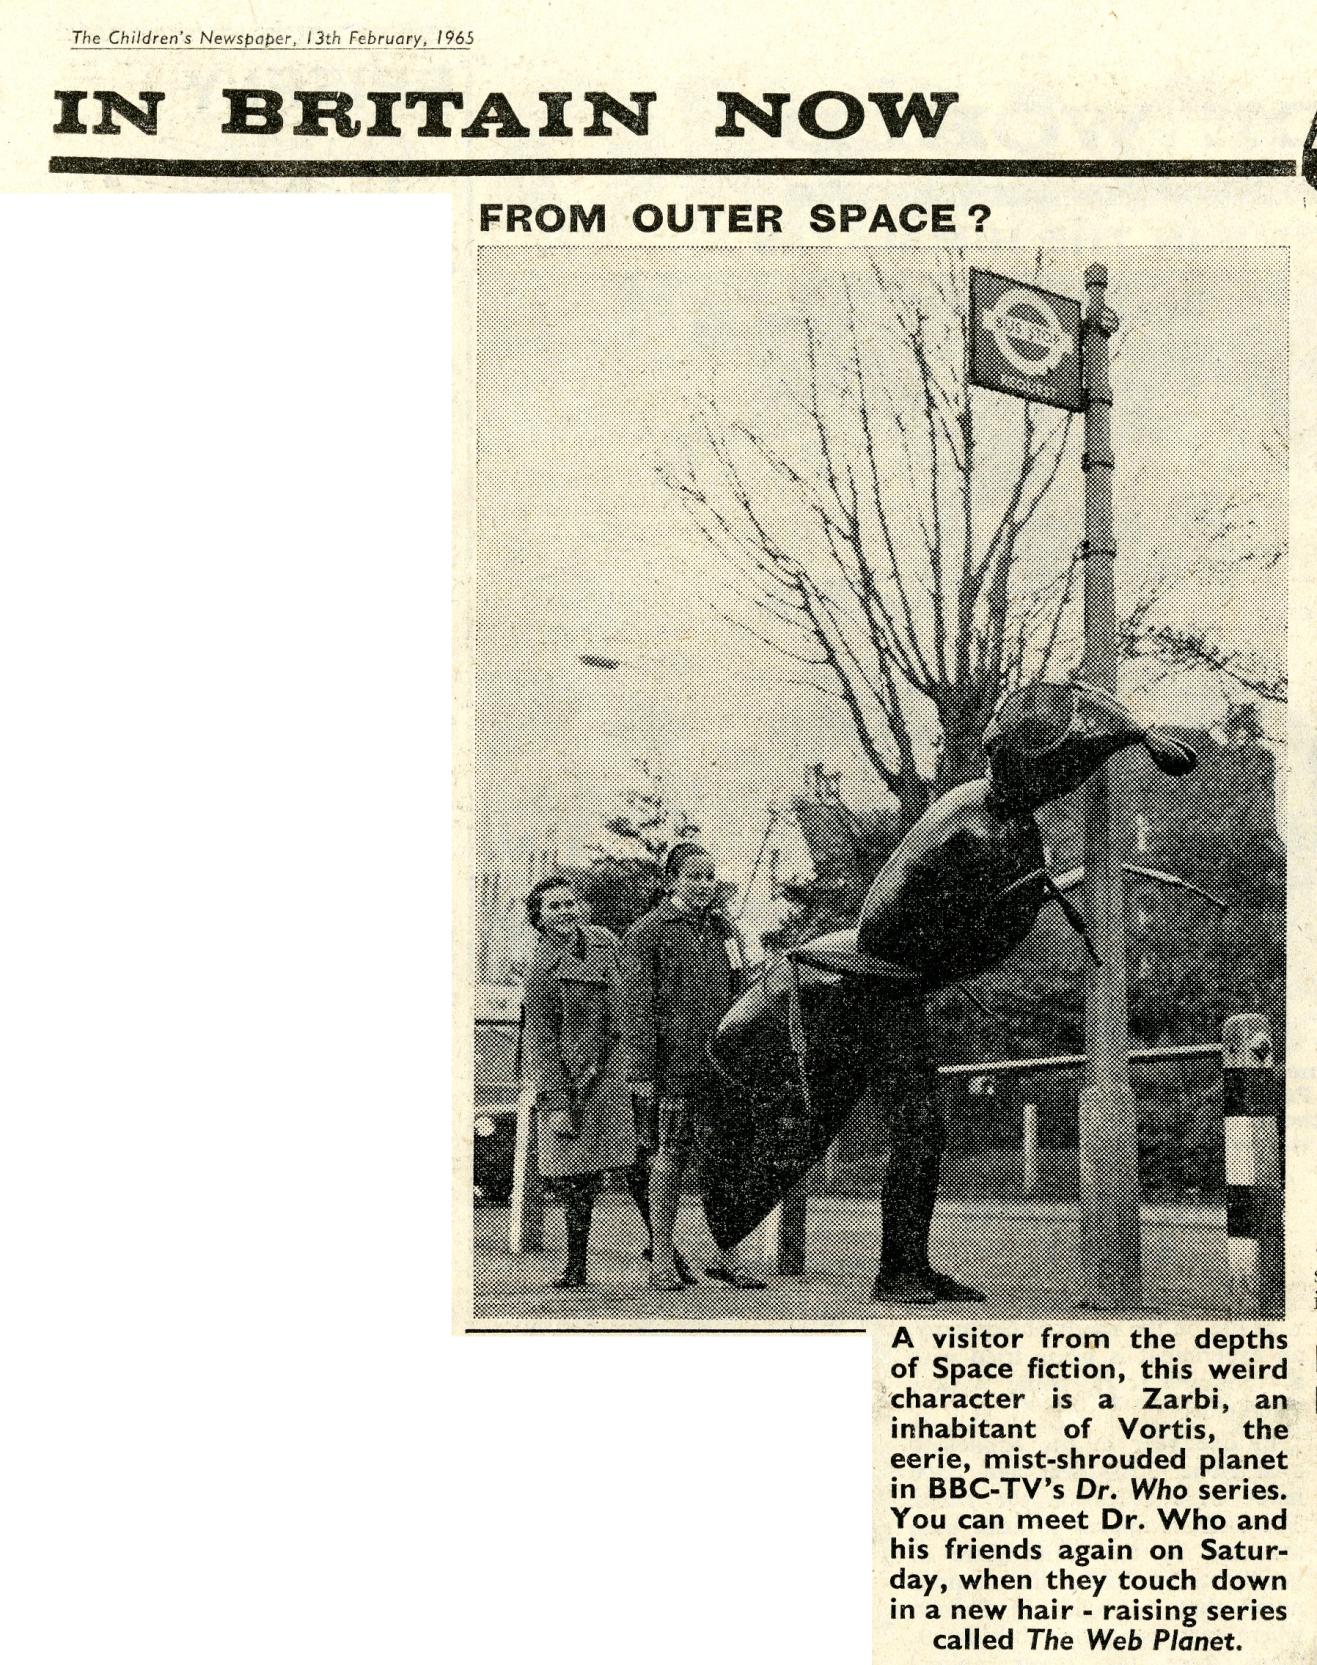 Children's Newspaper, 13 February 1965